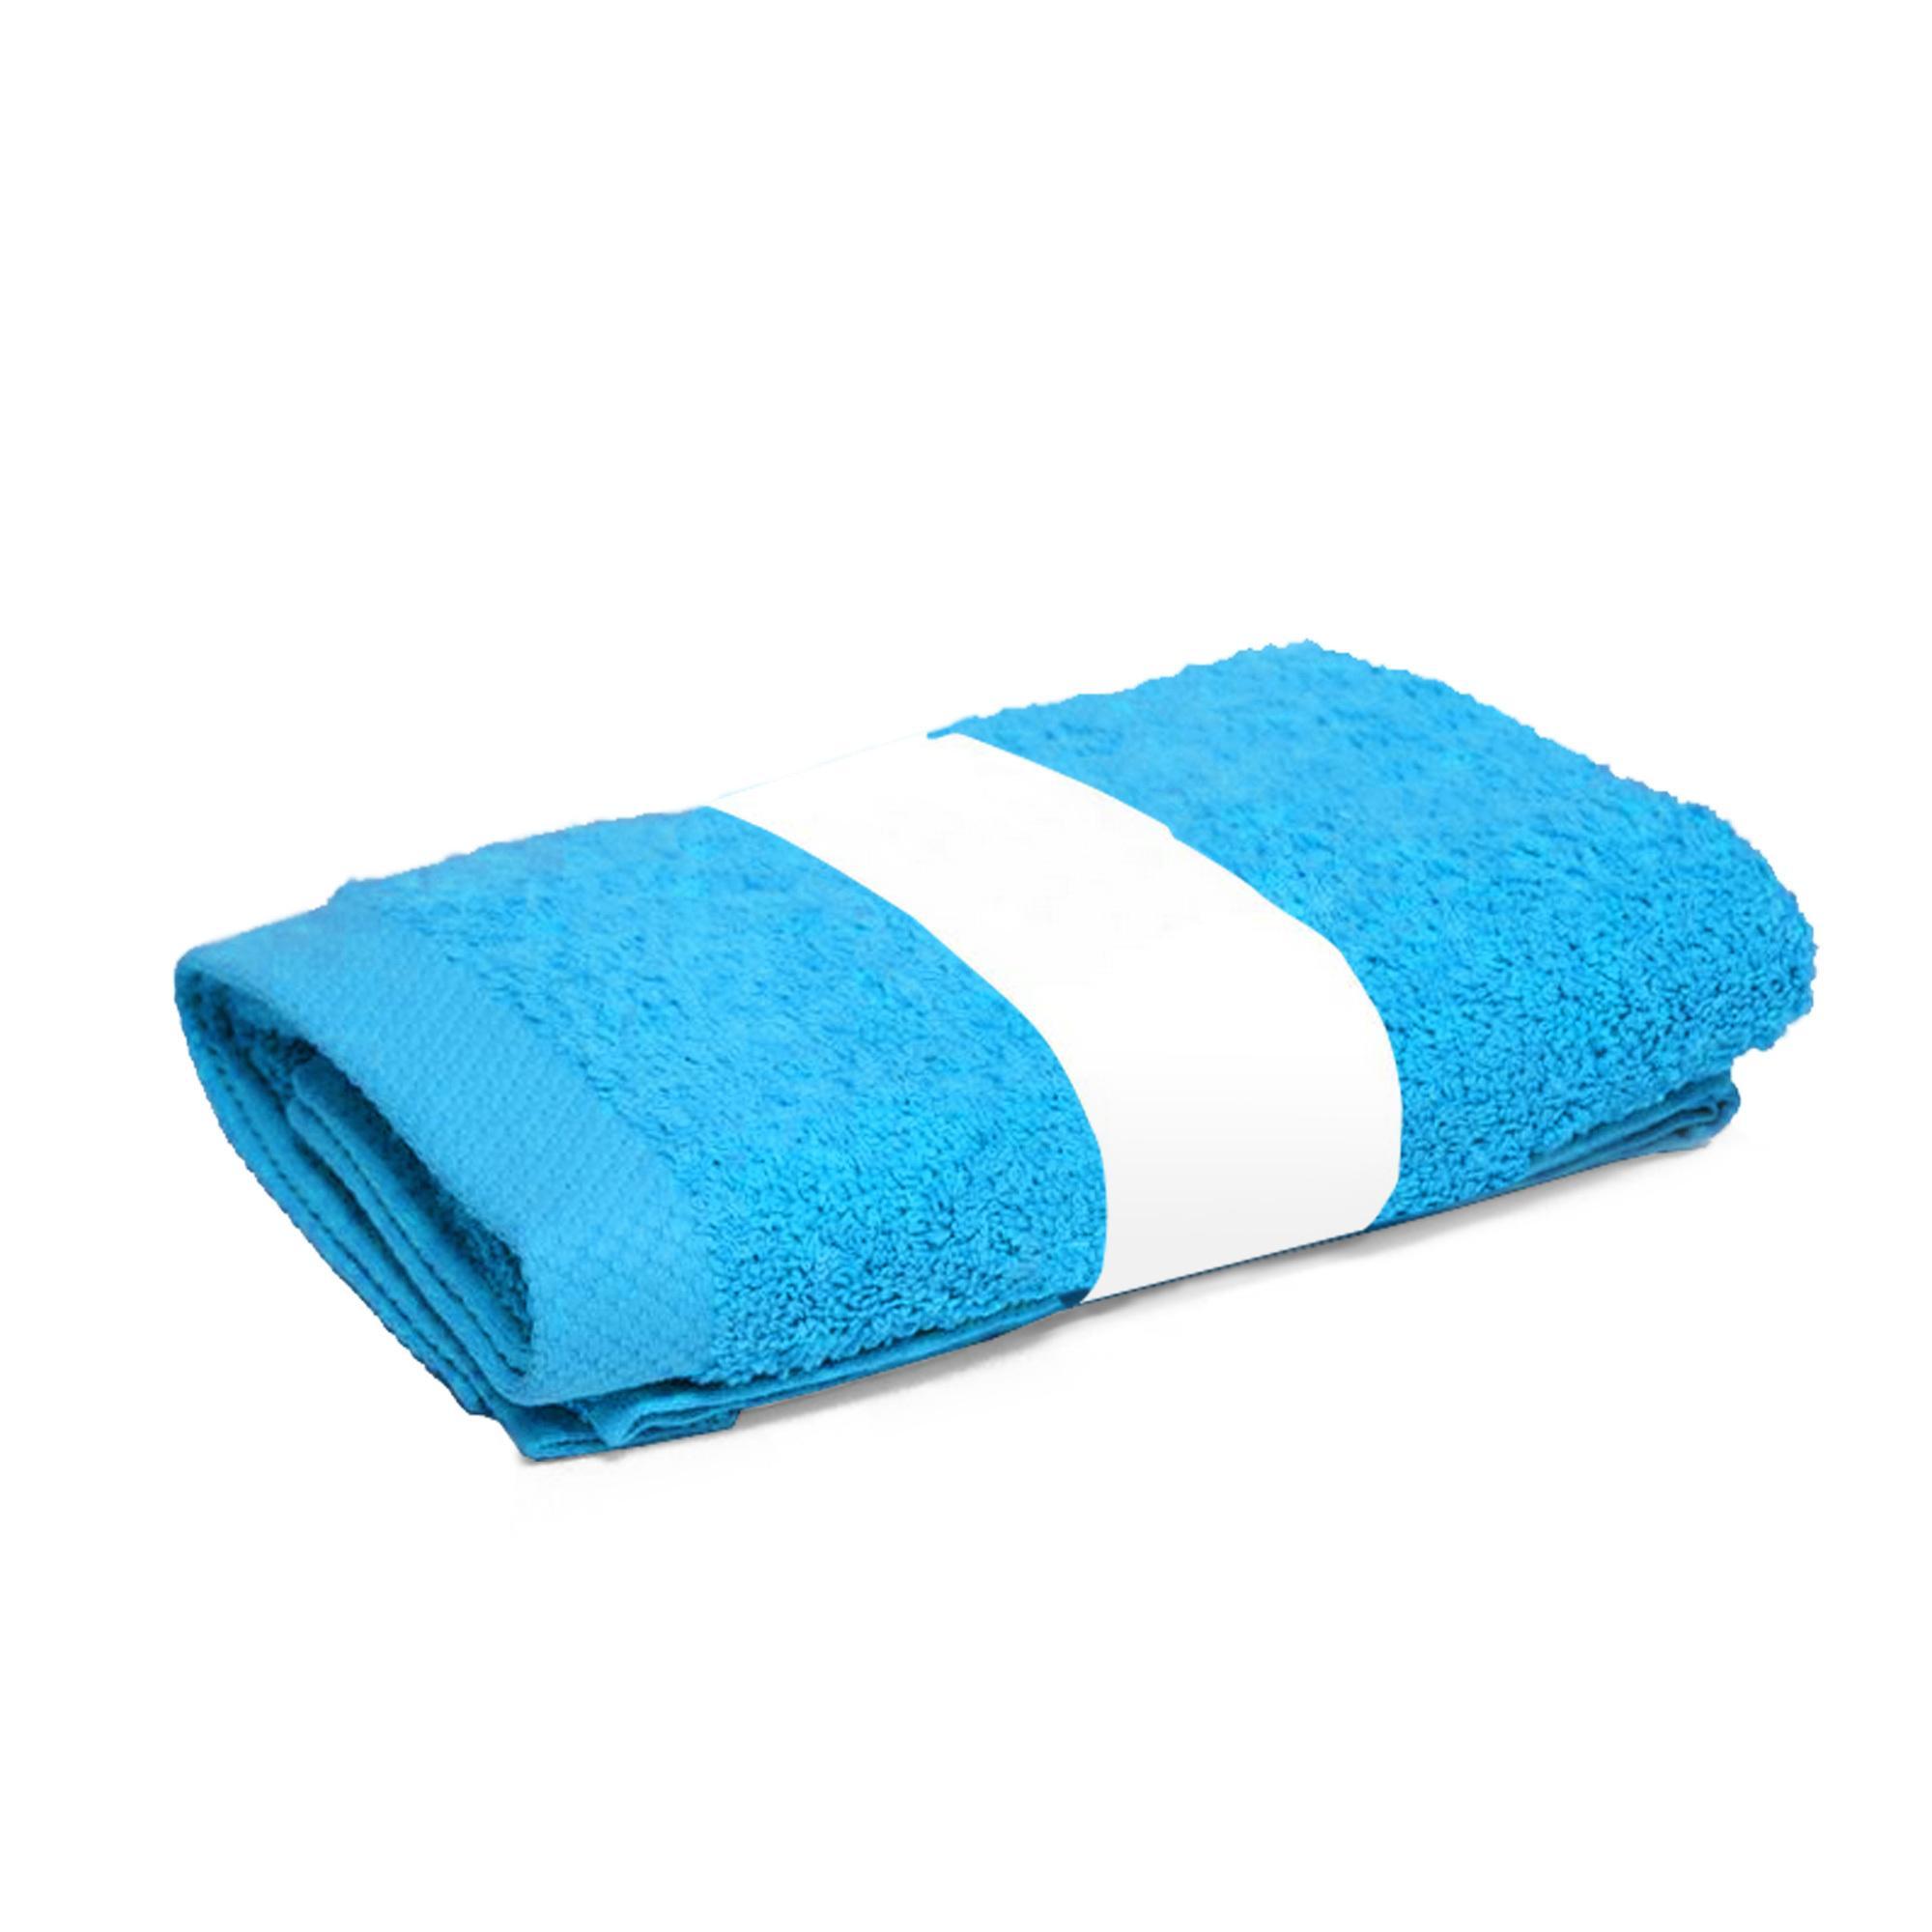 drap de bain 100x150 cm pure bleu oc an 550 g m2 ebay. Black Bedroom Furniture Sets. Home Design Ideas